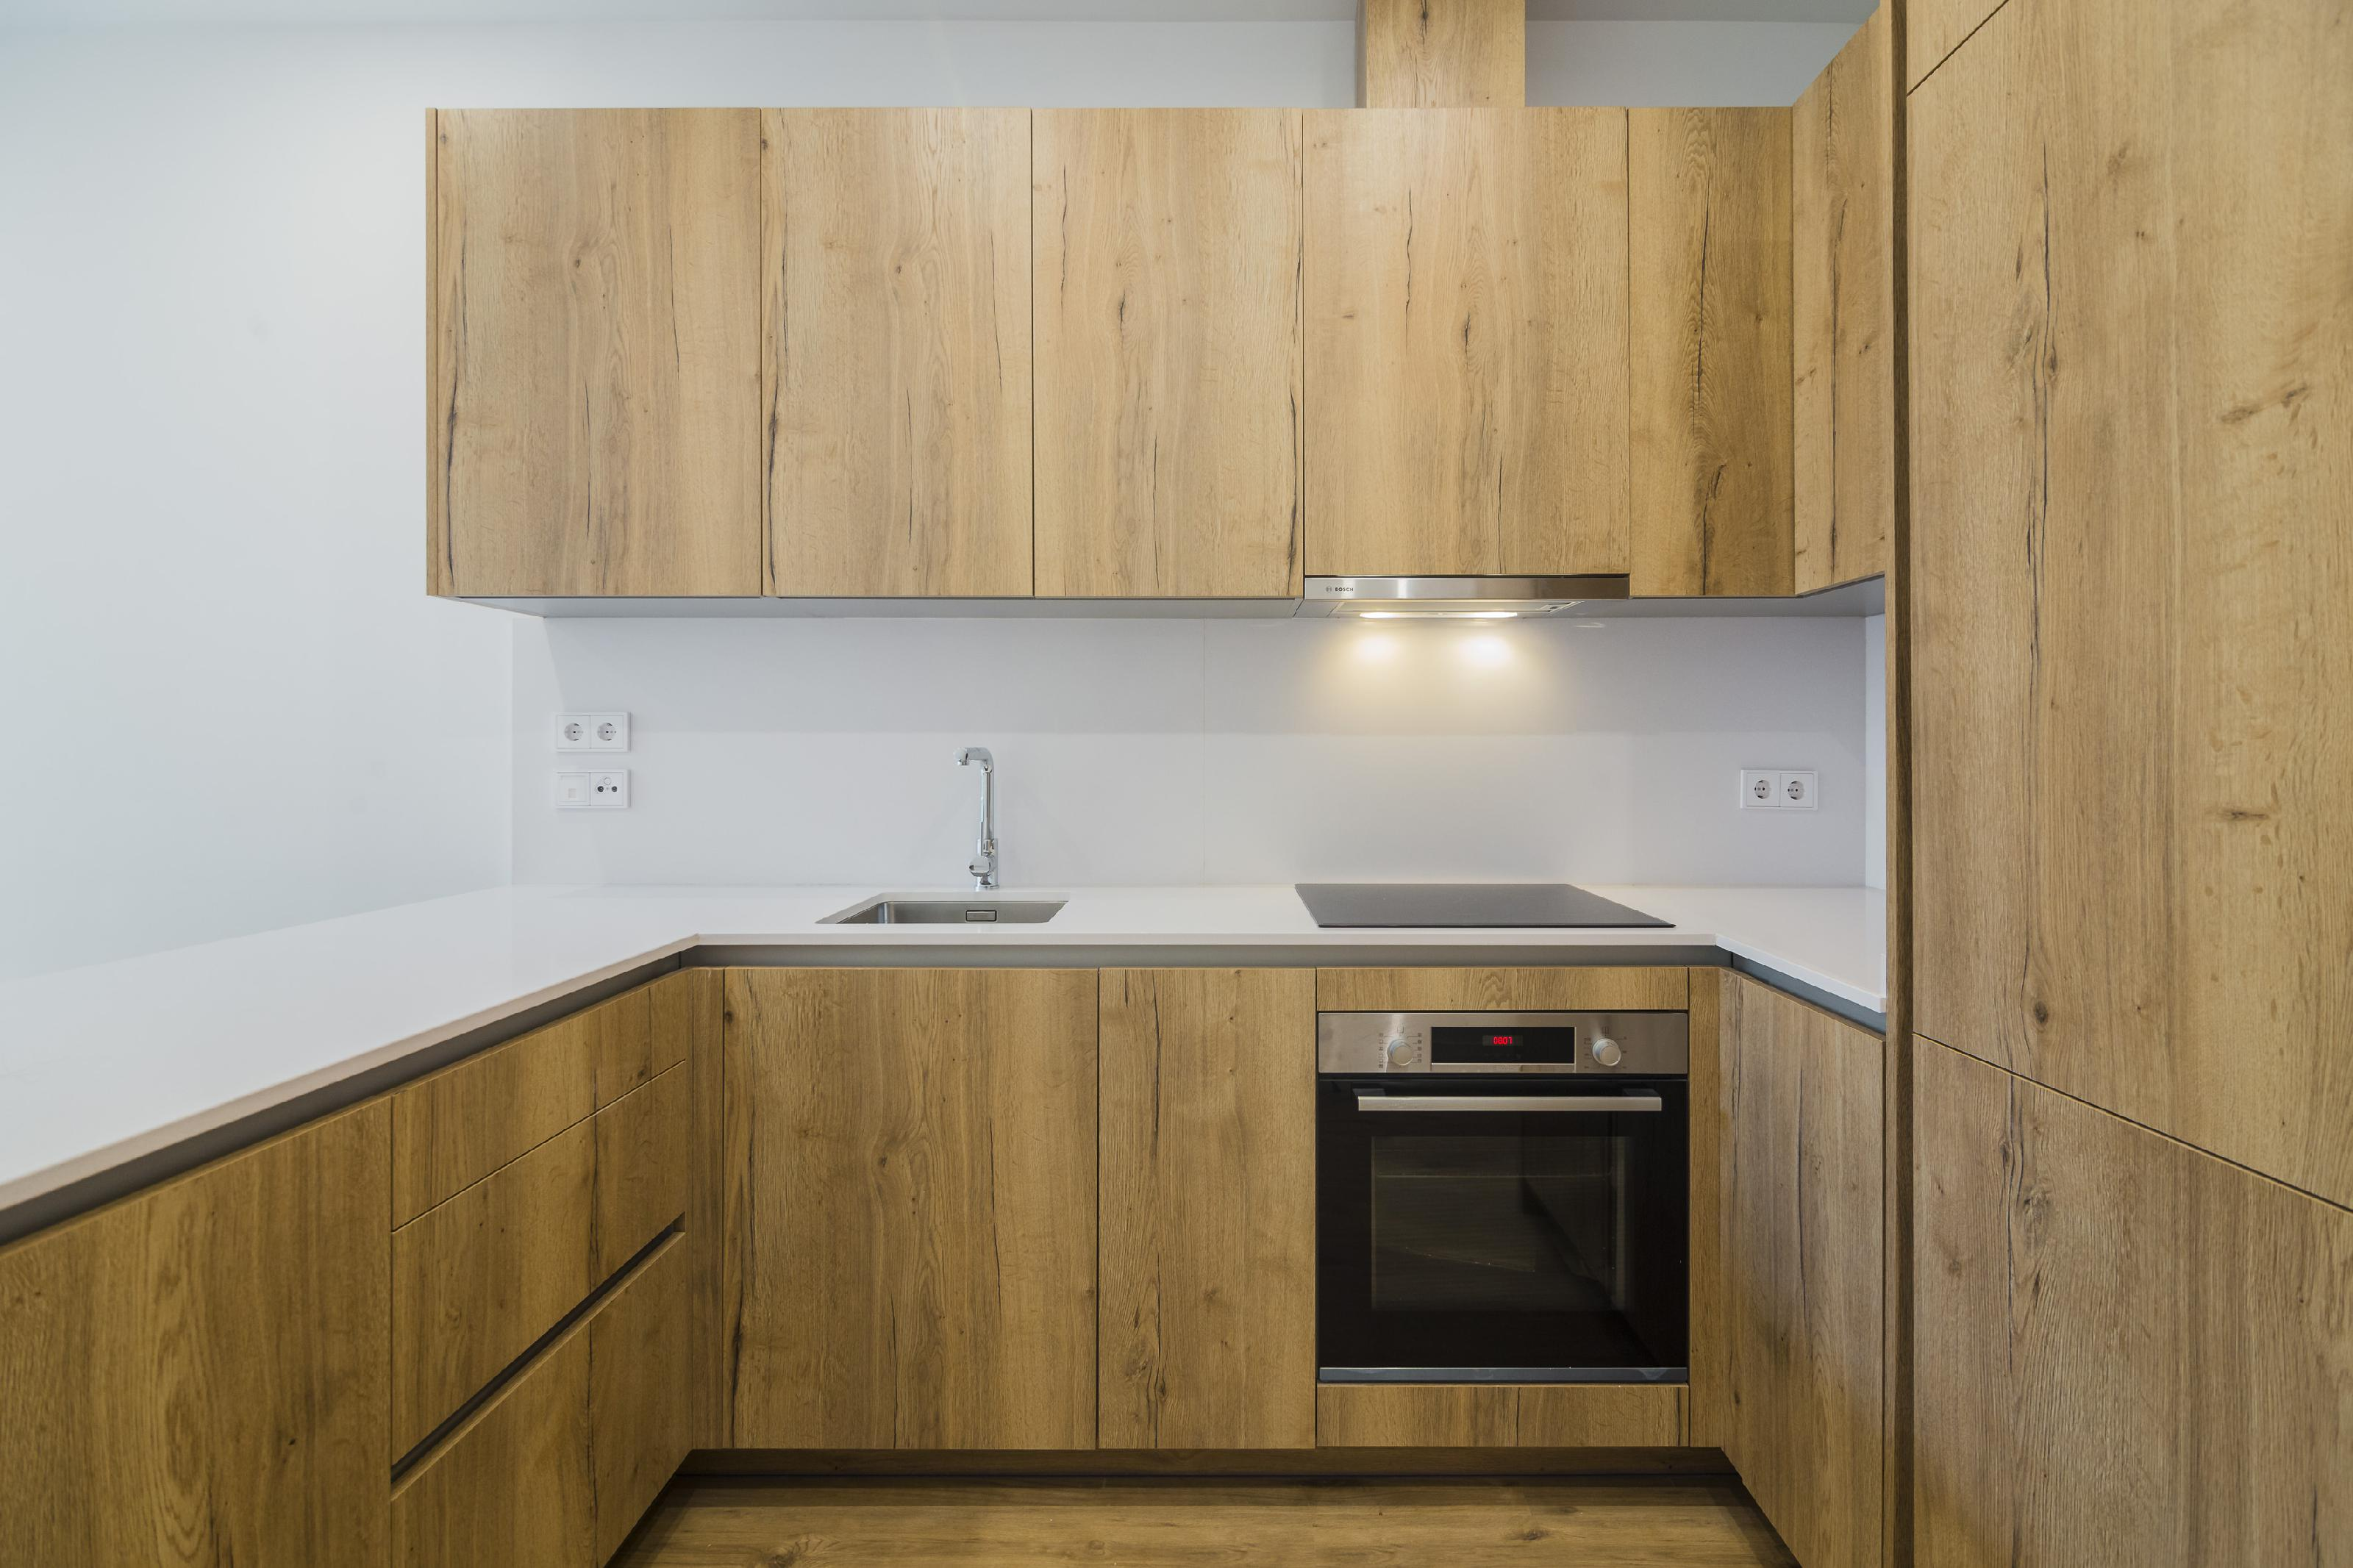 249858 Flat for sale in Eixample, Nova Esquerra Eixample 4